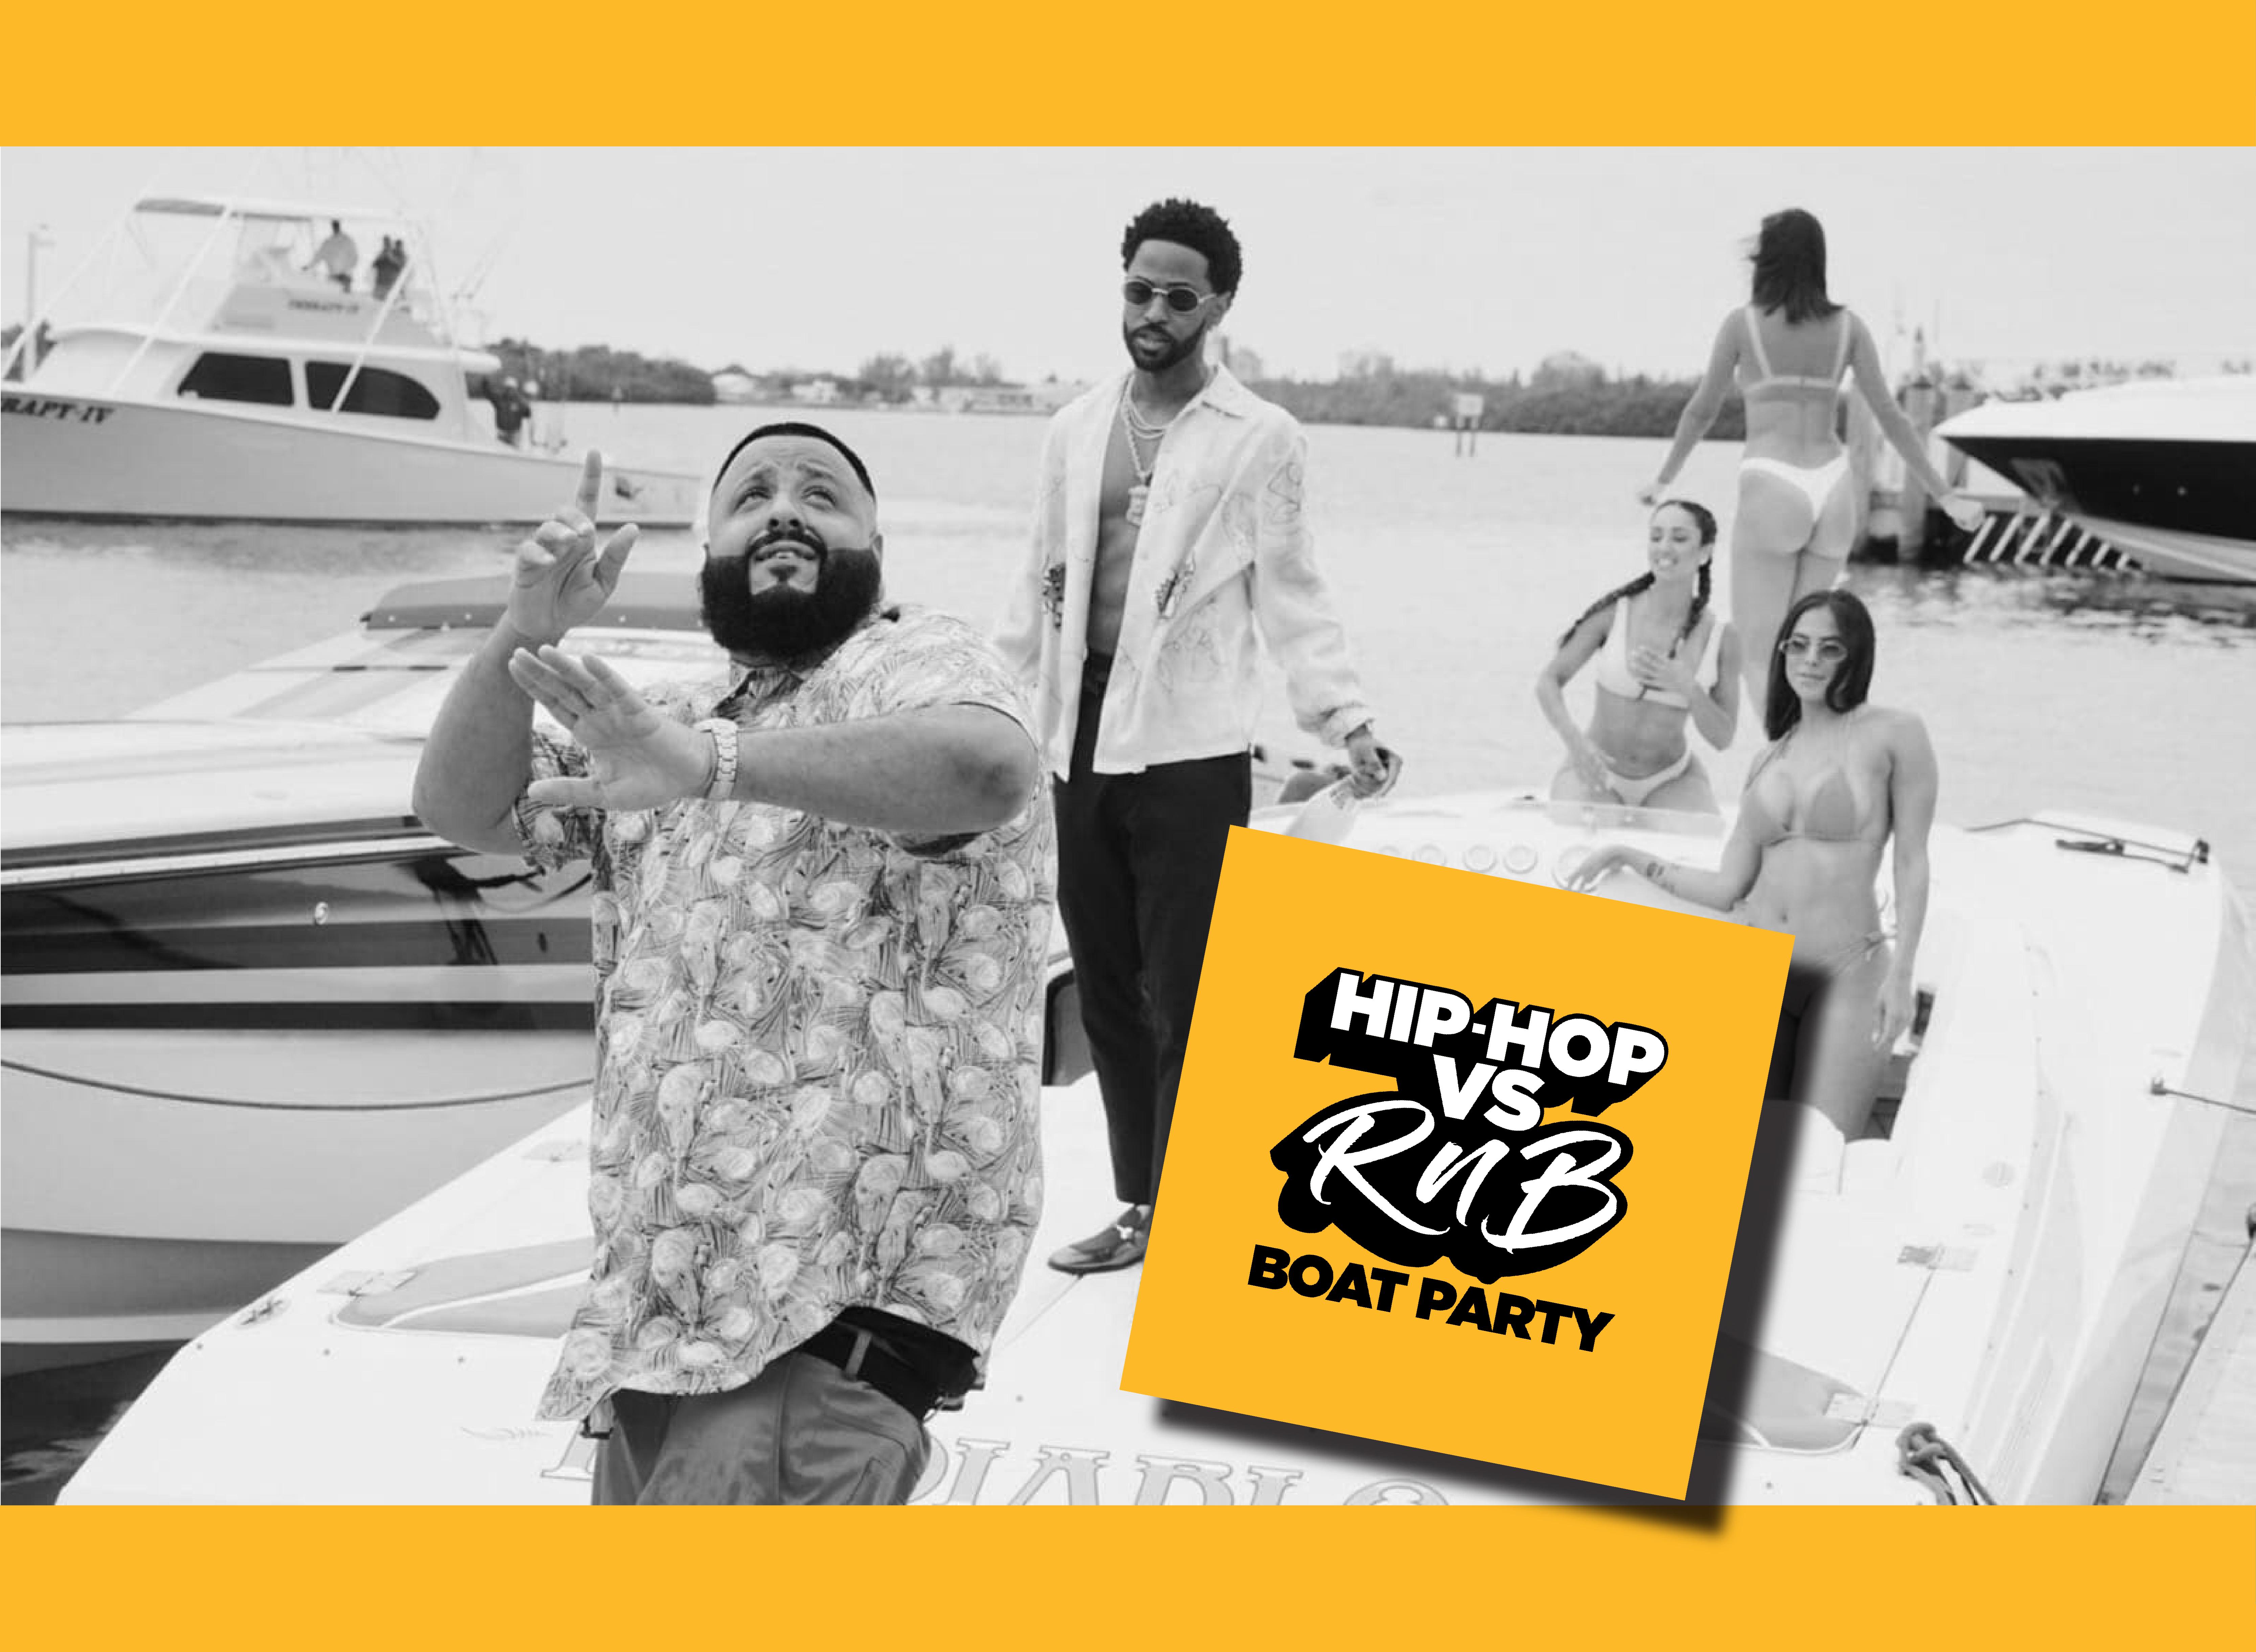 Hip-Hop vs RnB Boat Party - Bank Holiday